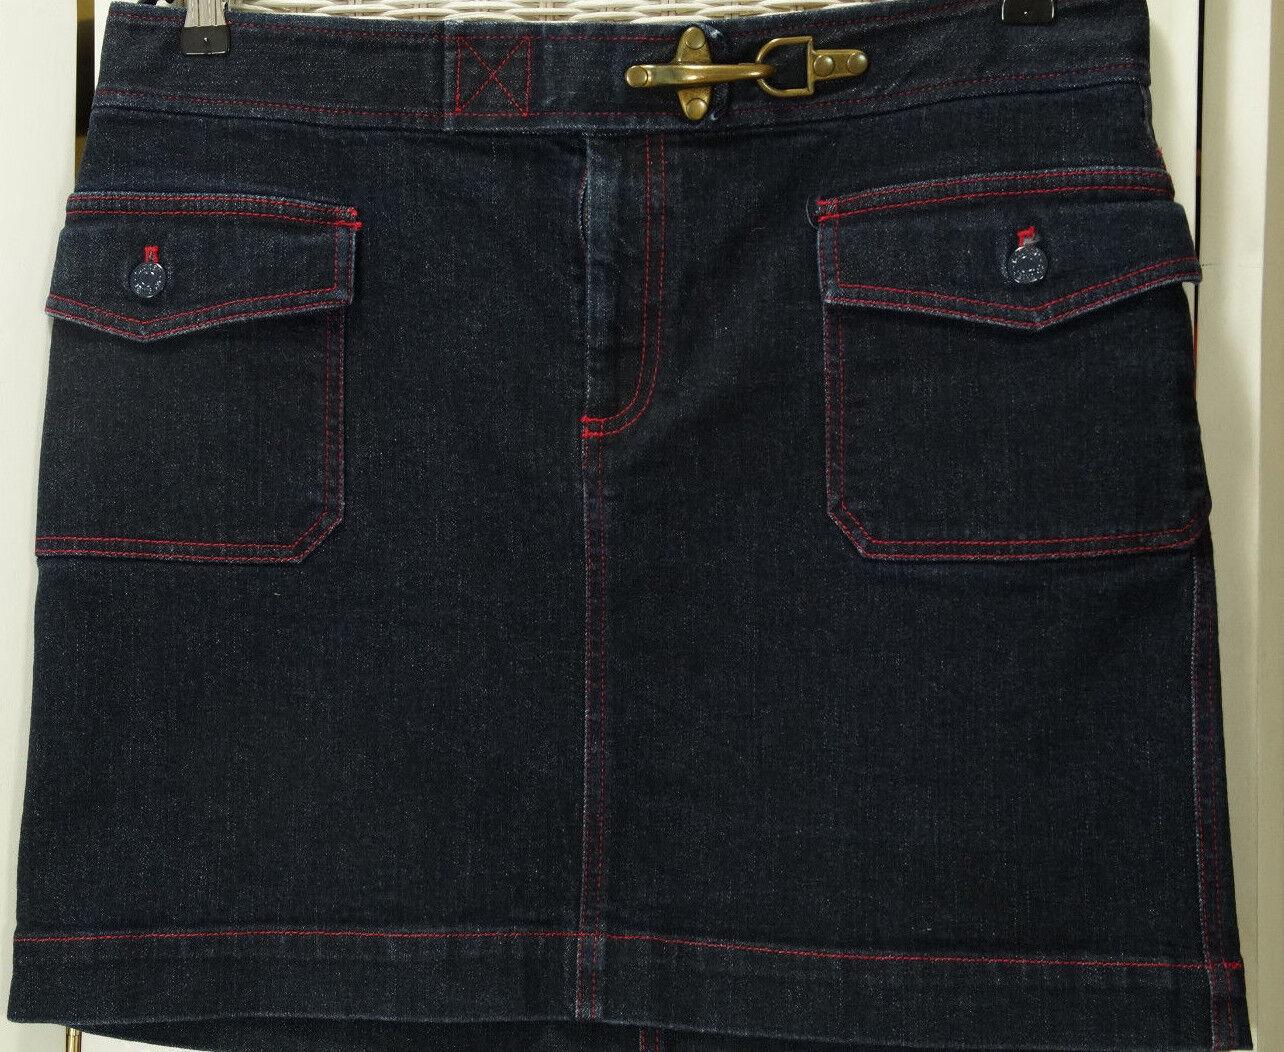 LAUREN JEANS CO. Denim Mini Skirt 37  Waist US14 Ralph Lauren Jeans Pencil Skirt